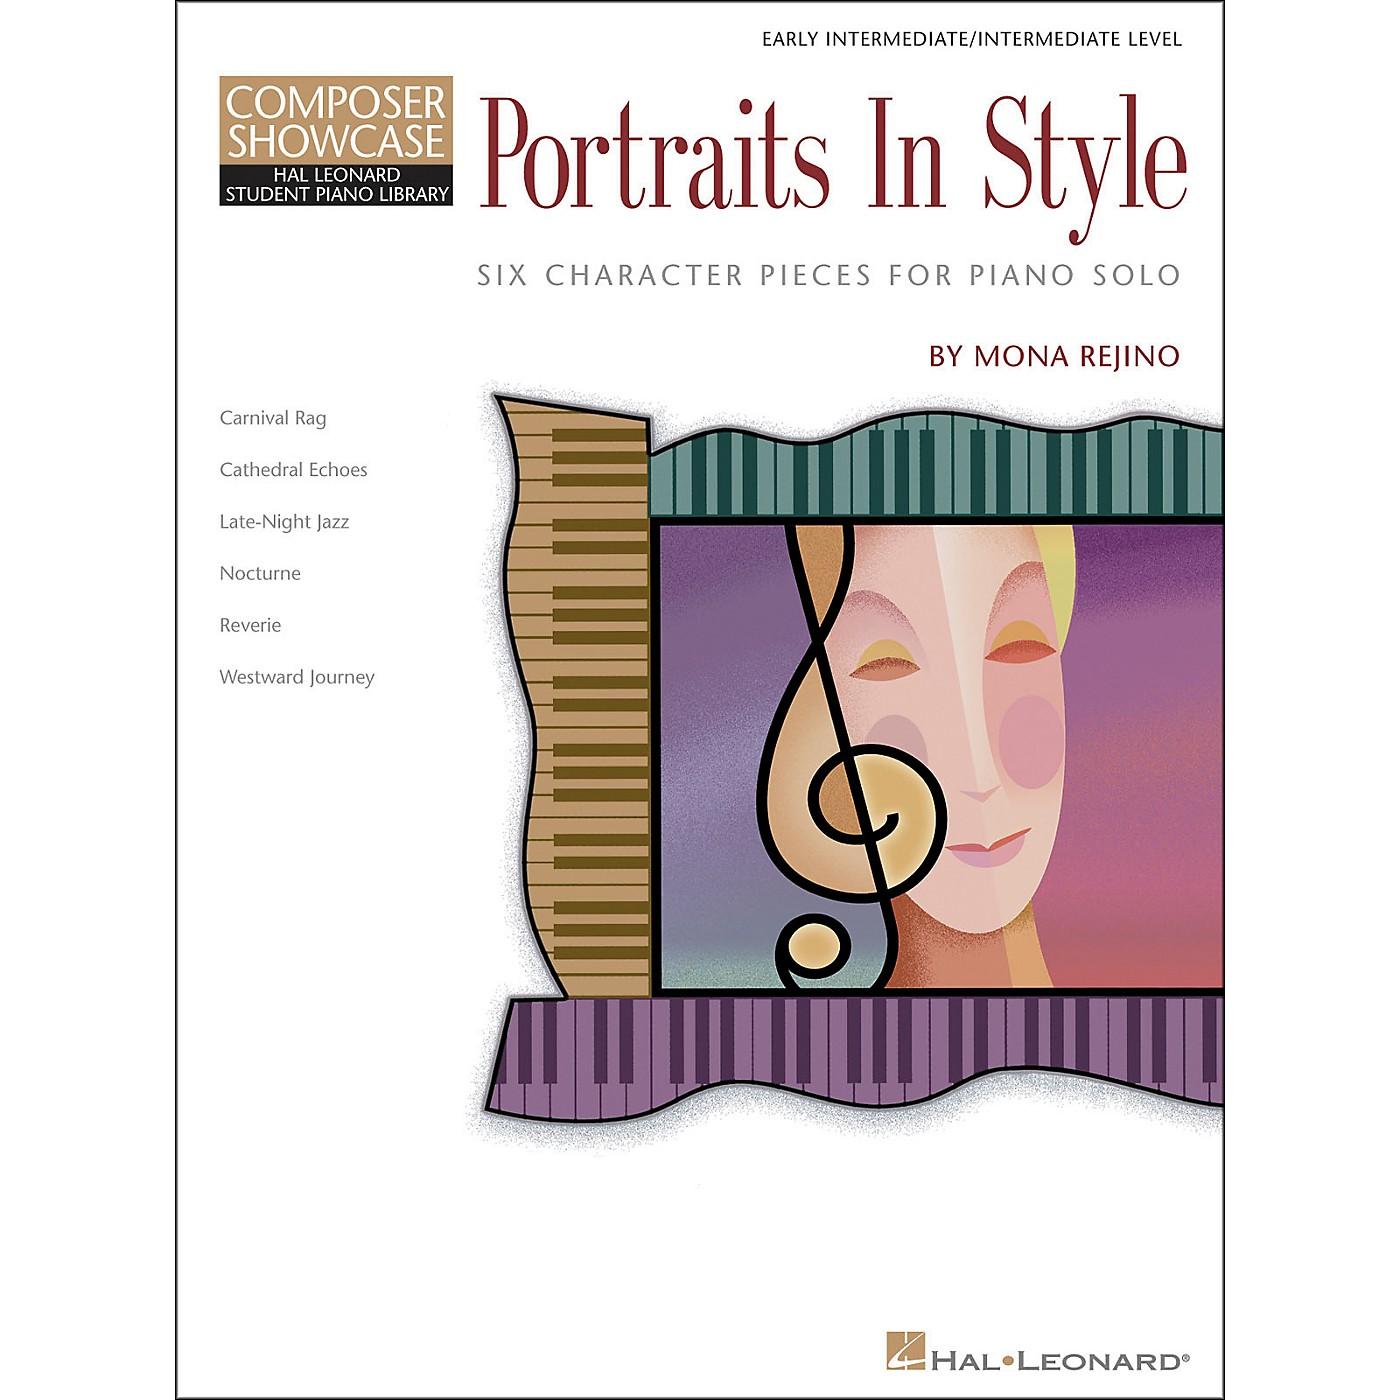 Hal Leonard Portraits In Style - Early Intermediate/Intermediate Level Composer Showcase Hal Leonard Student Piano Library by Mona Rejino thumbnail